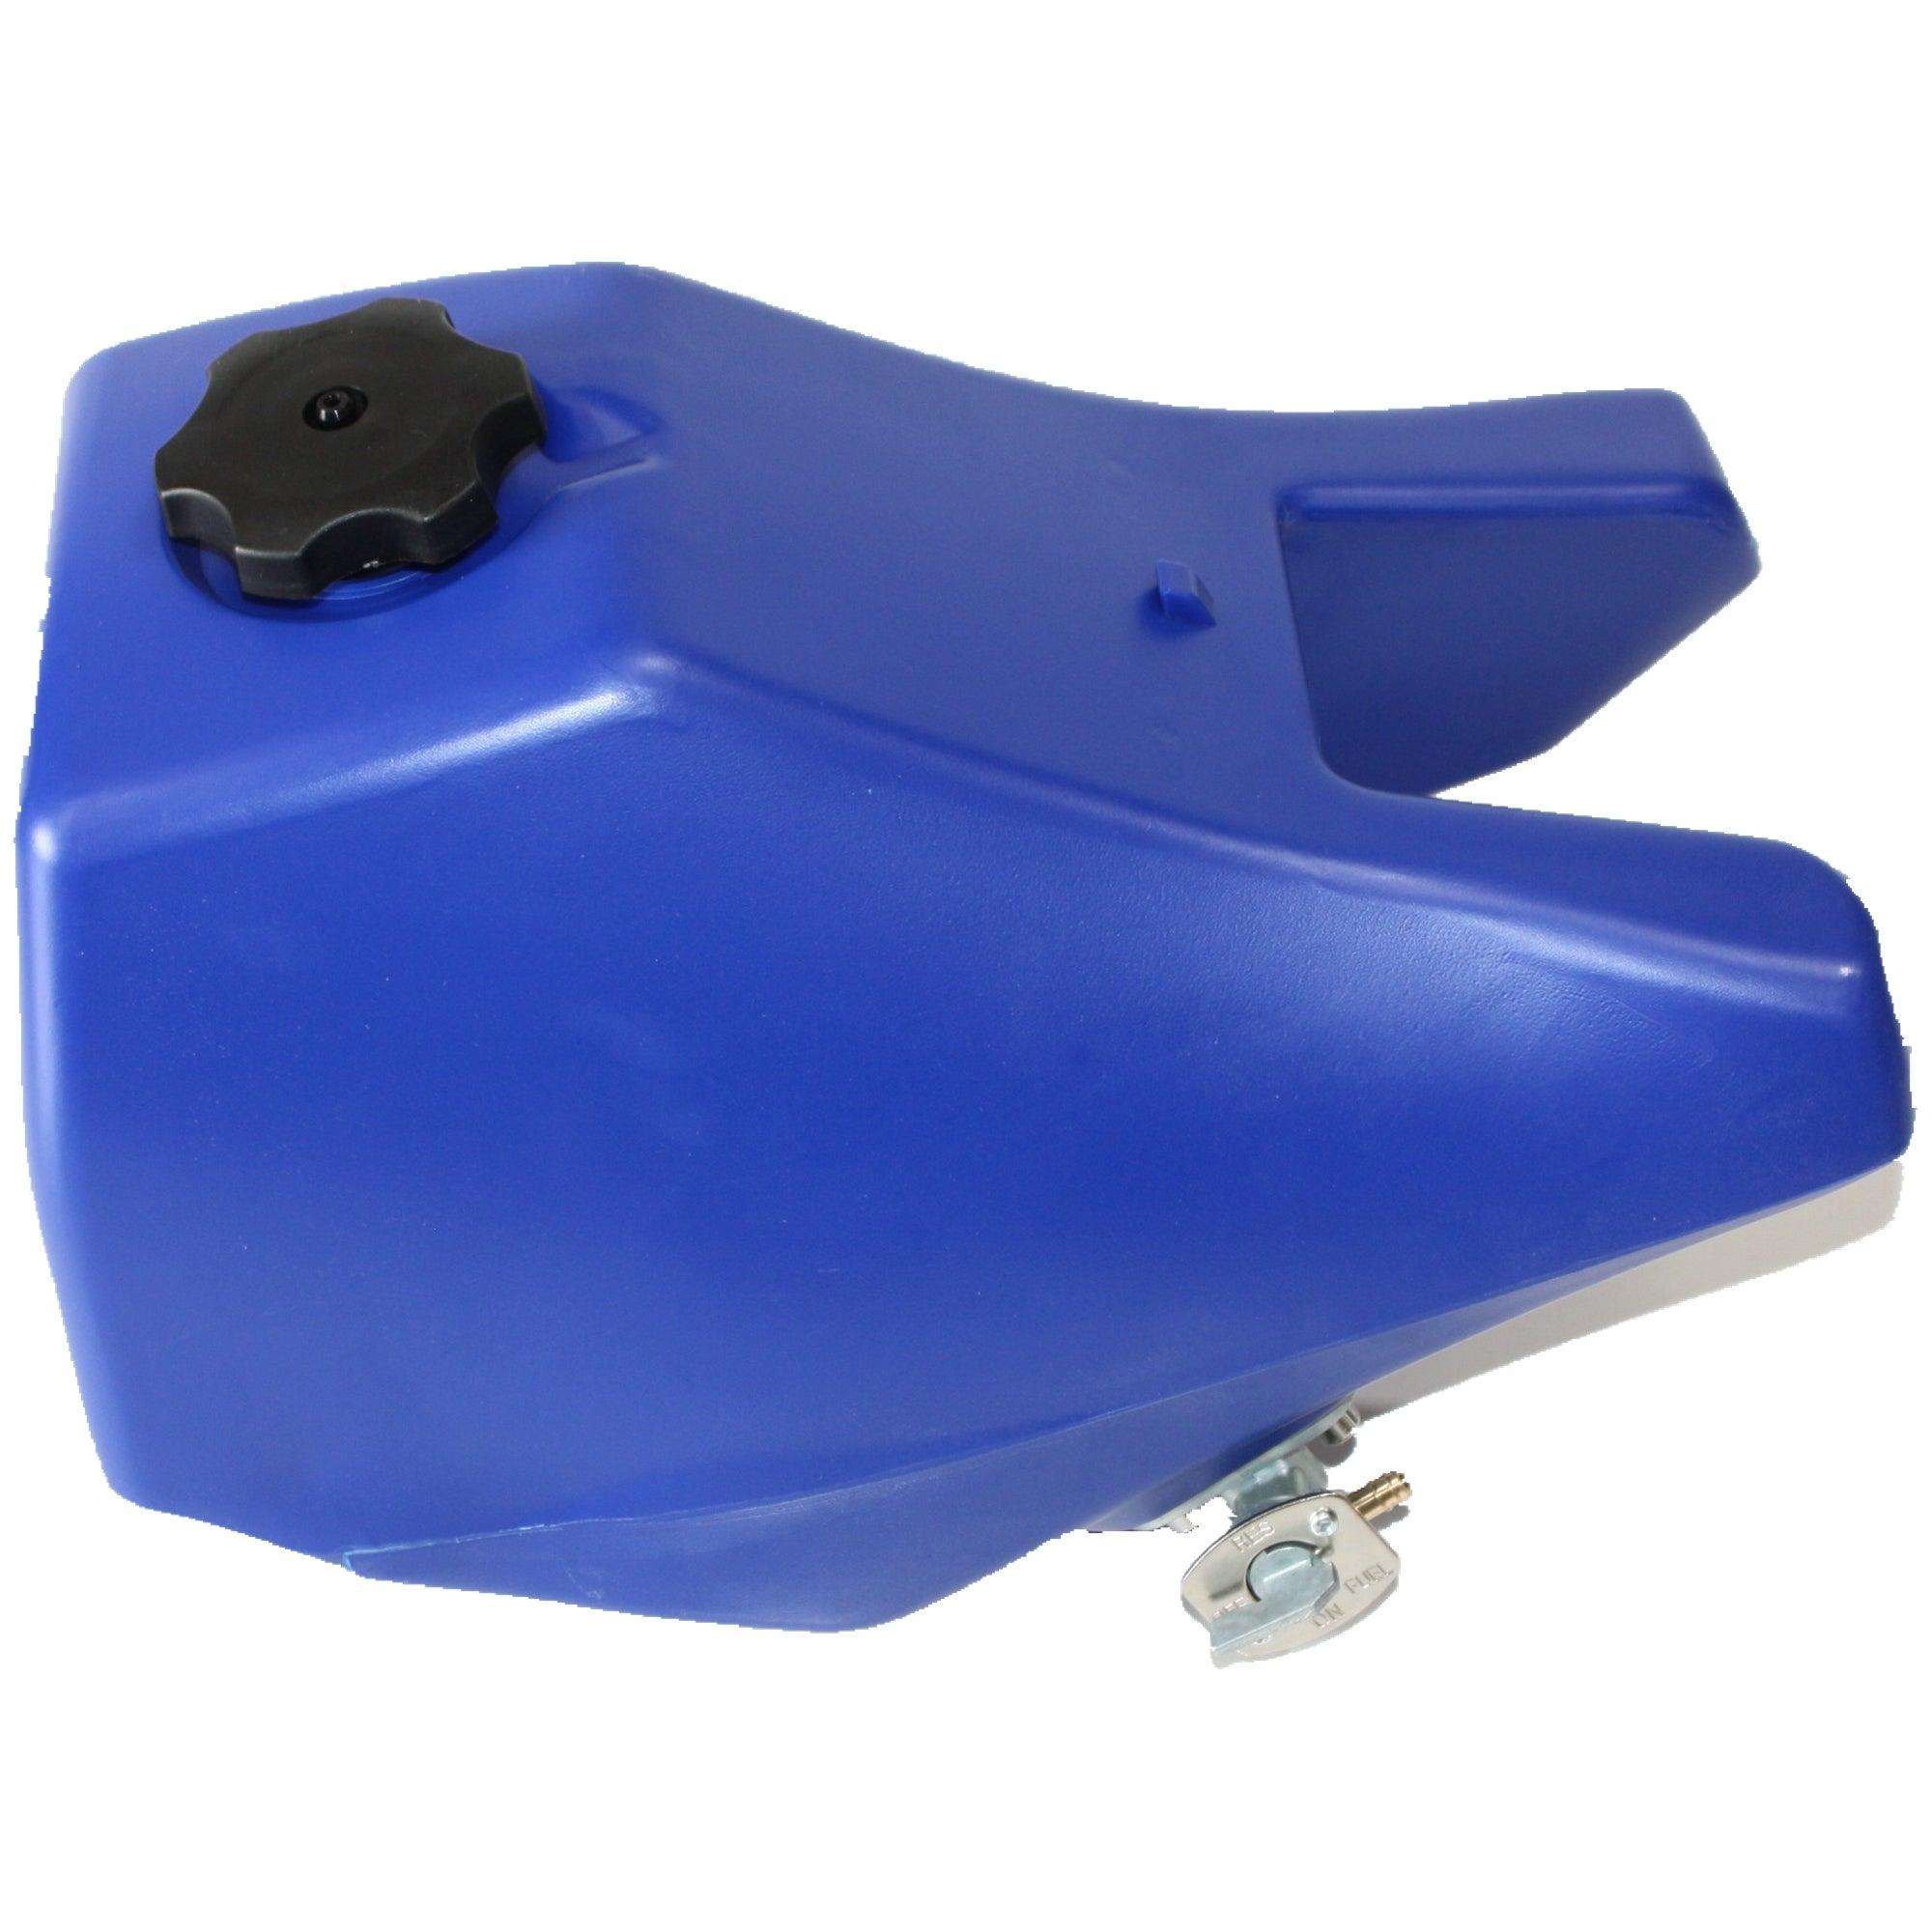 BLUE PETROL FUEL TANK YAMAHA PY80 PW80 PEEWEE80 PIT TRIAL DIRT BIKE Y-ZINGER